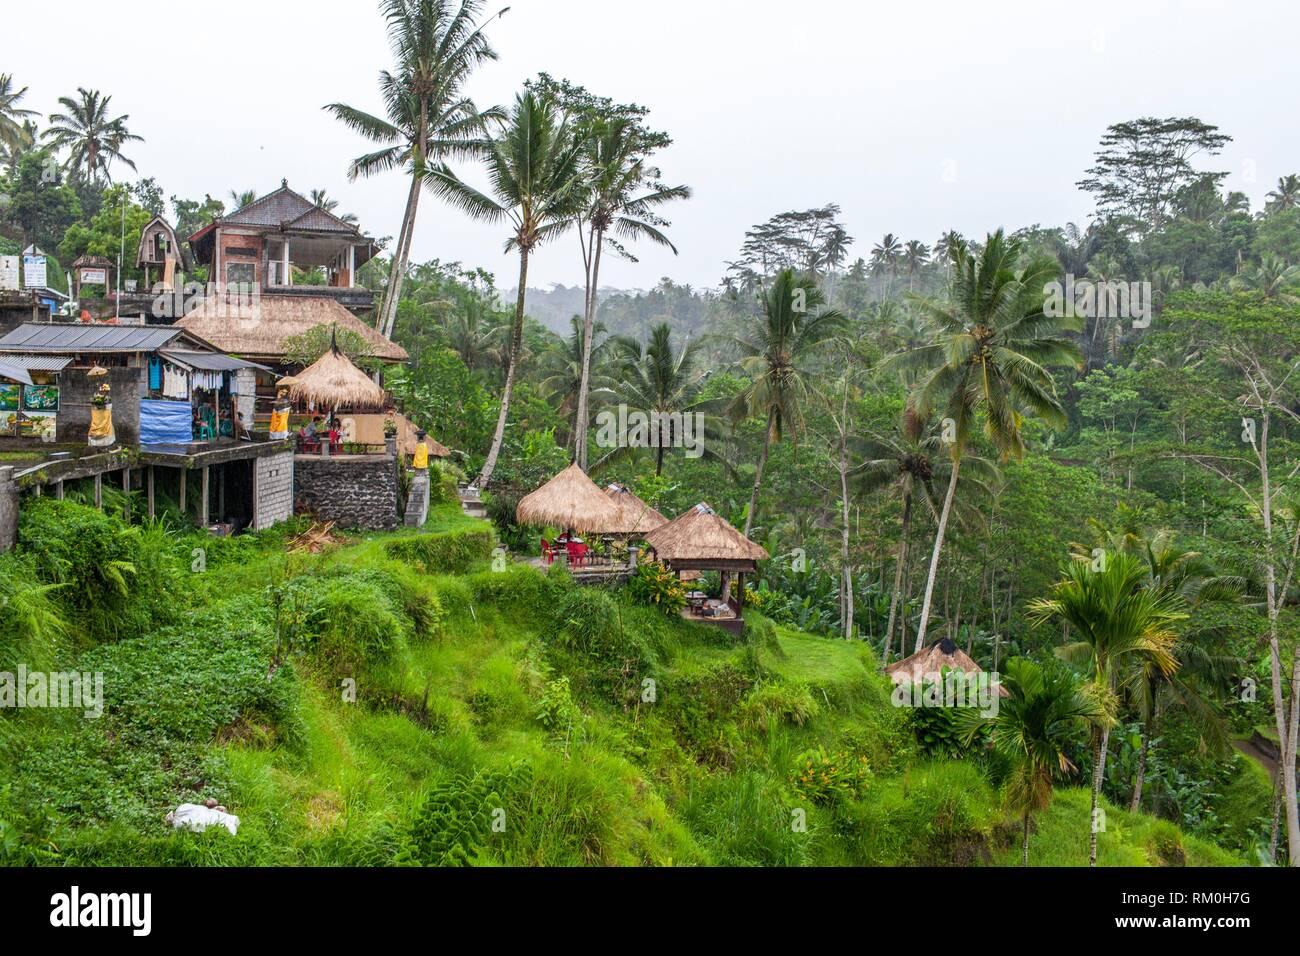 Tegallalang Rice Terrace, Bali - Stock Image